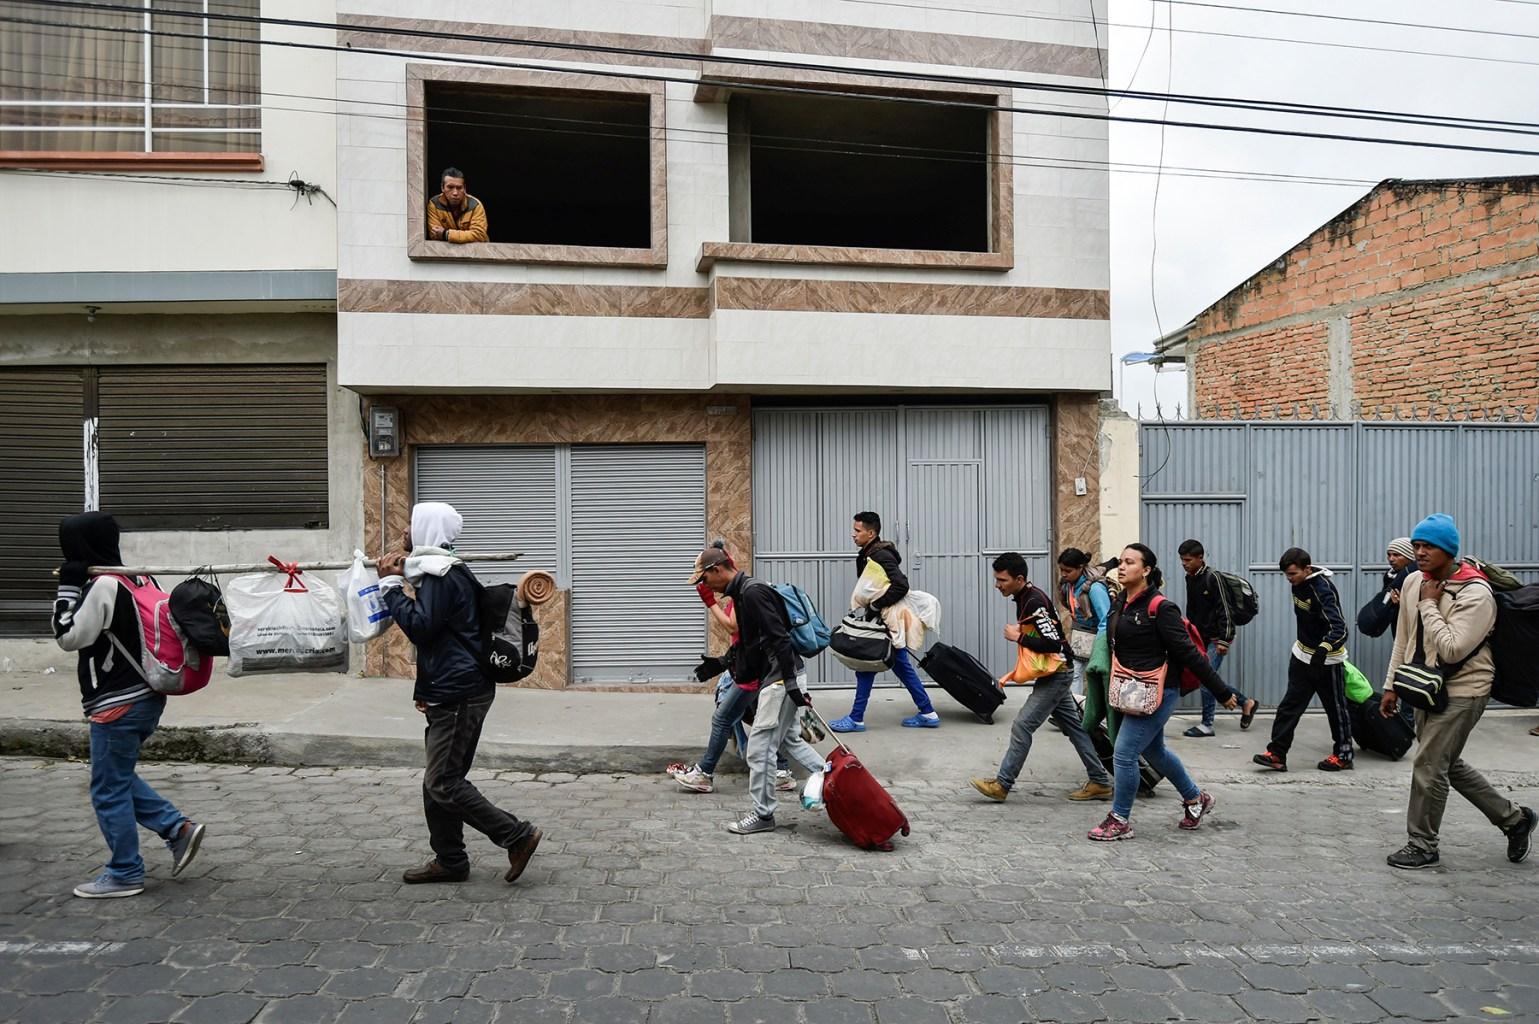 Venezuelan migrants heading to Peru walk along the streets of Tulcan, Ecuador, on Aug. 21. LUIS ROBAYO/AFP/Getty Images